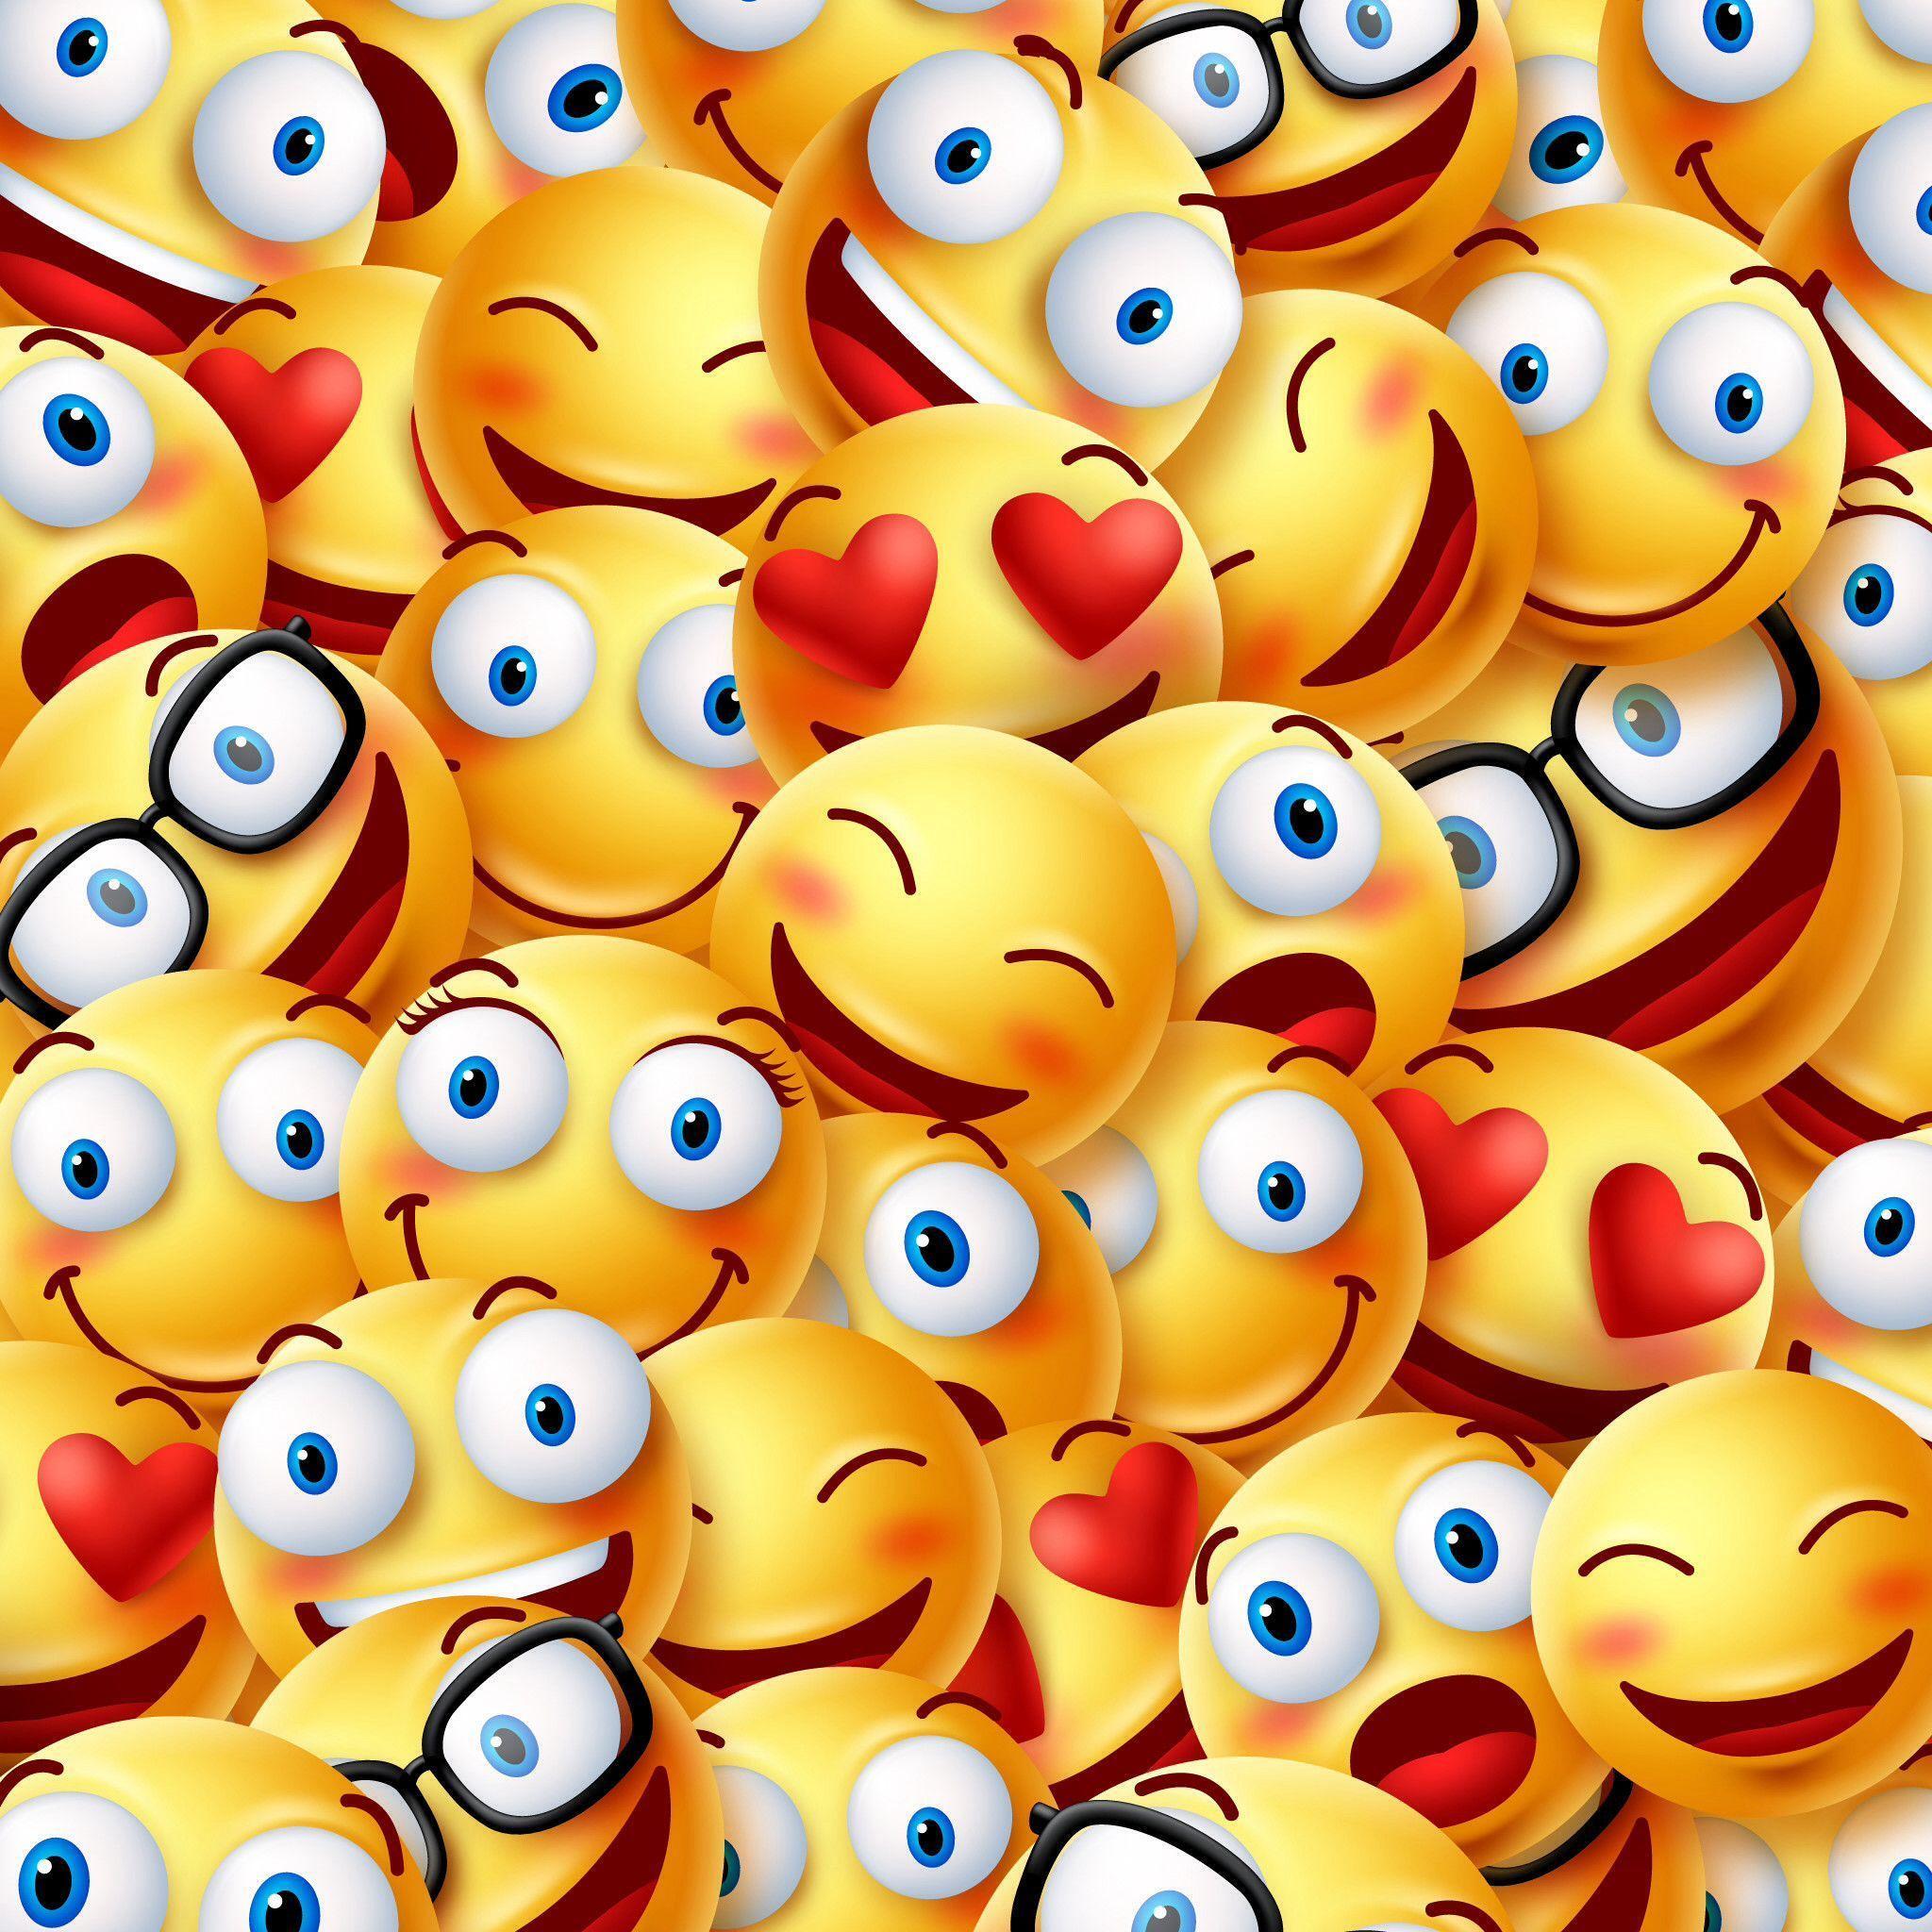 Smile Emoji Wallpapers - Top Free Smile Emoji Backgrounds ...